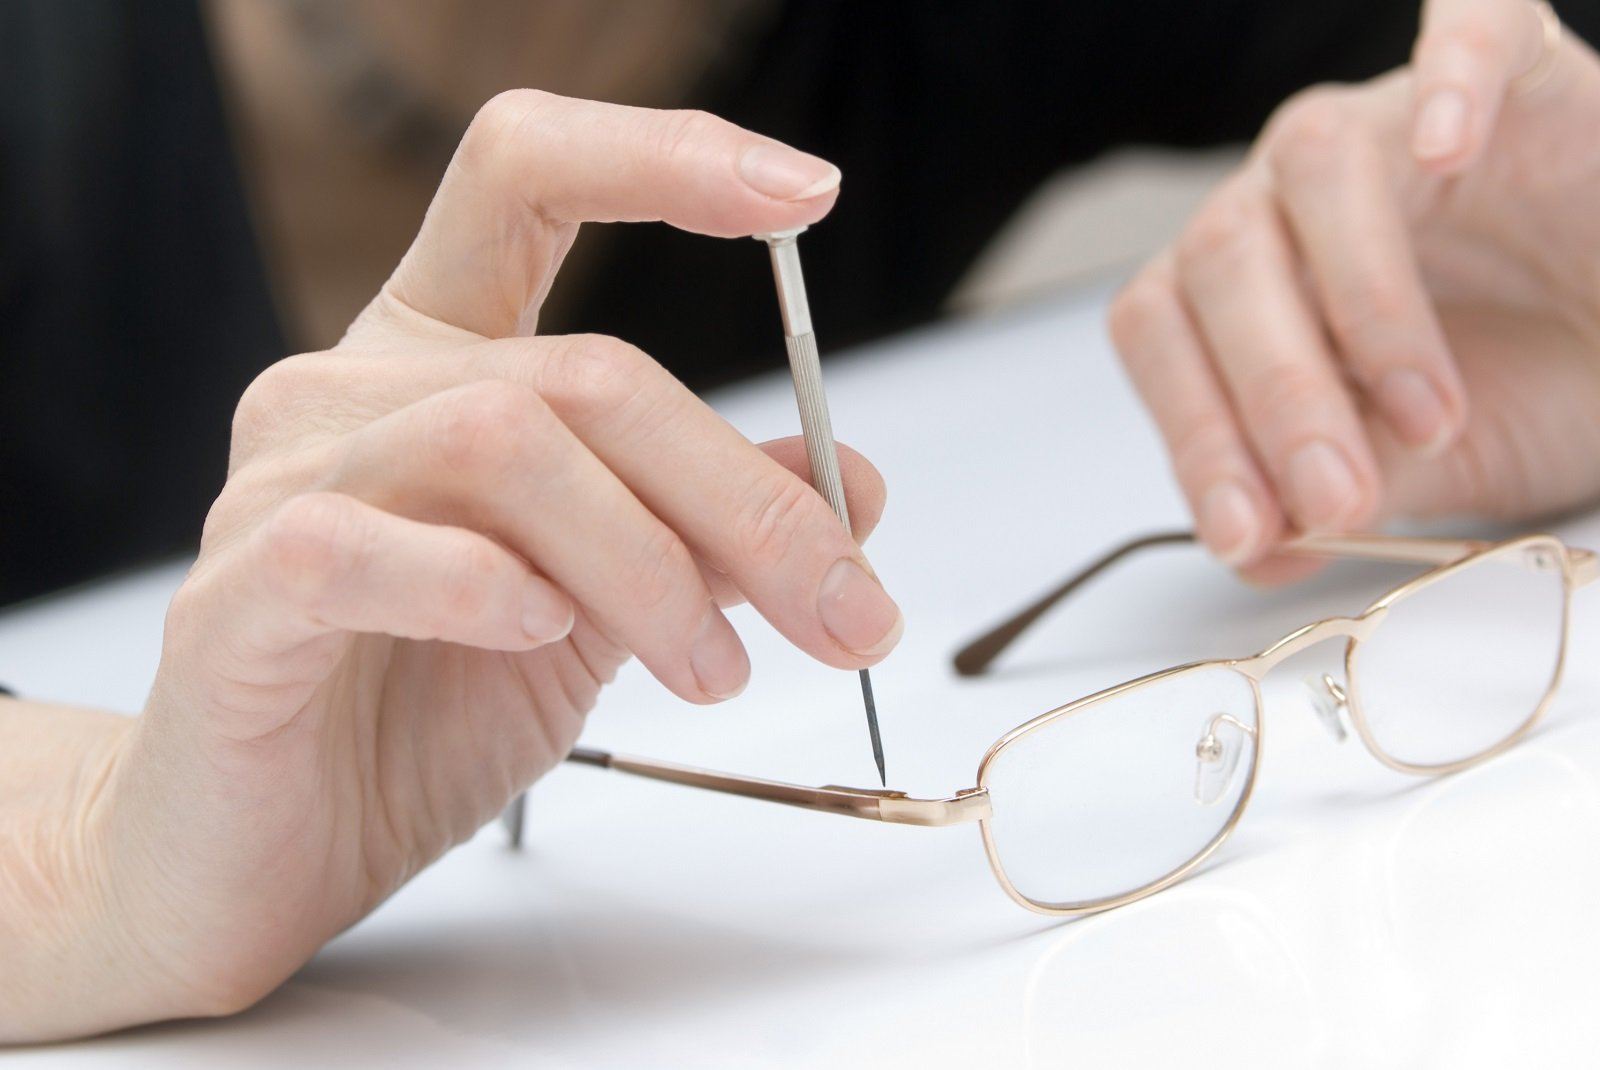 riparazione di occhiali da vista